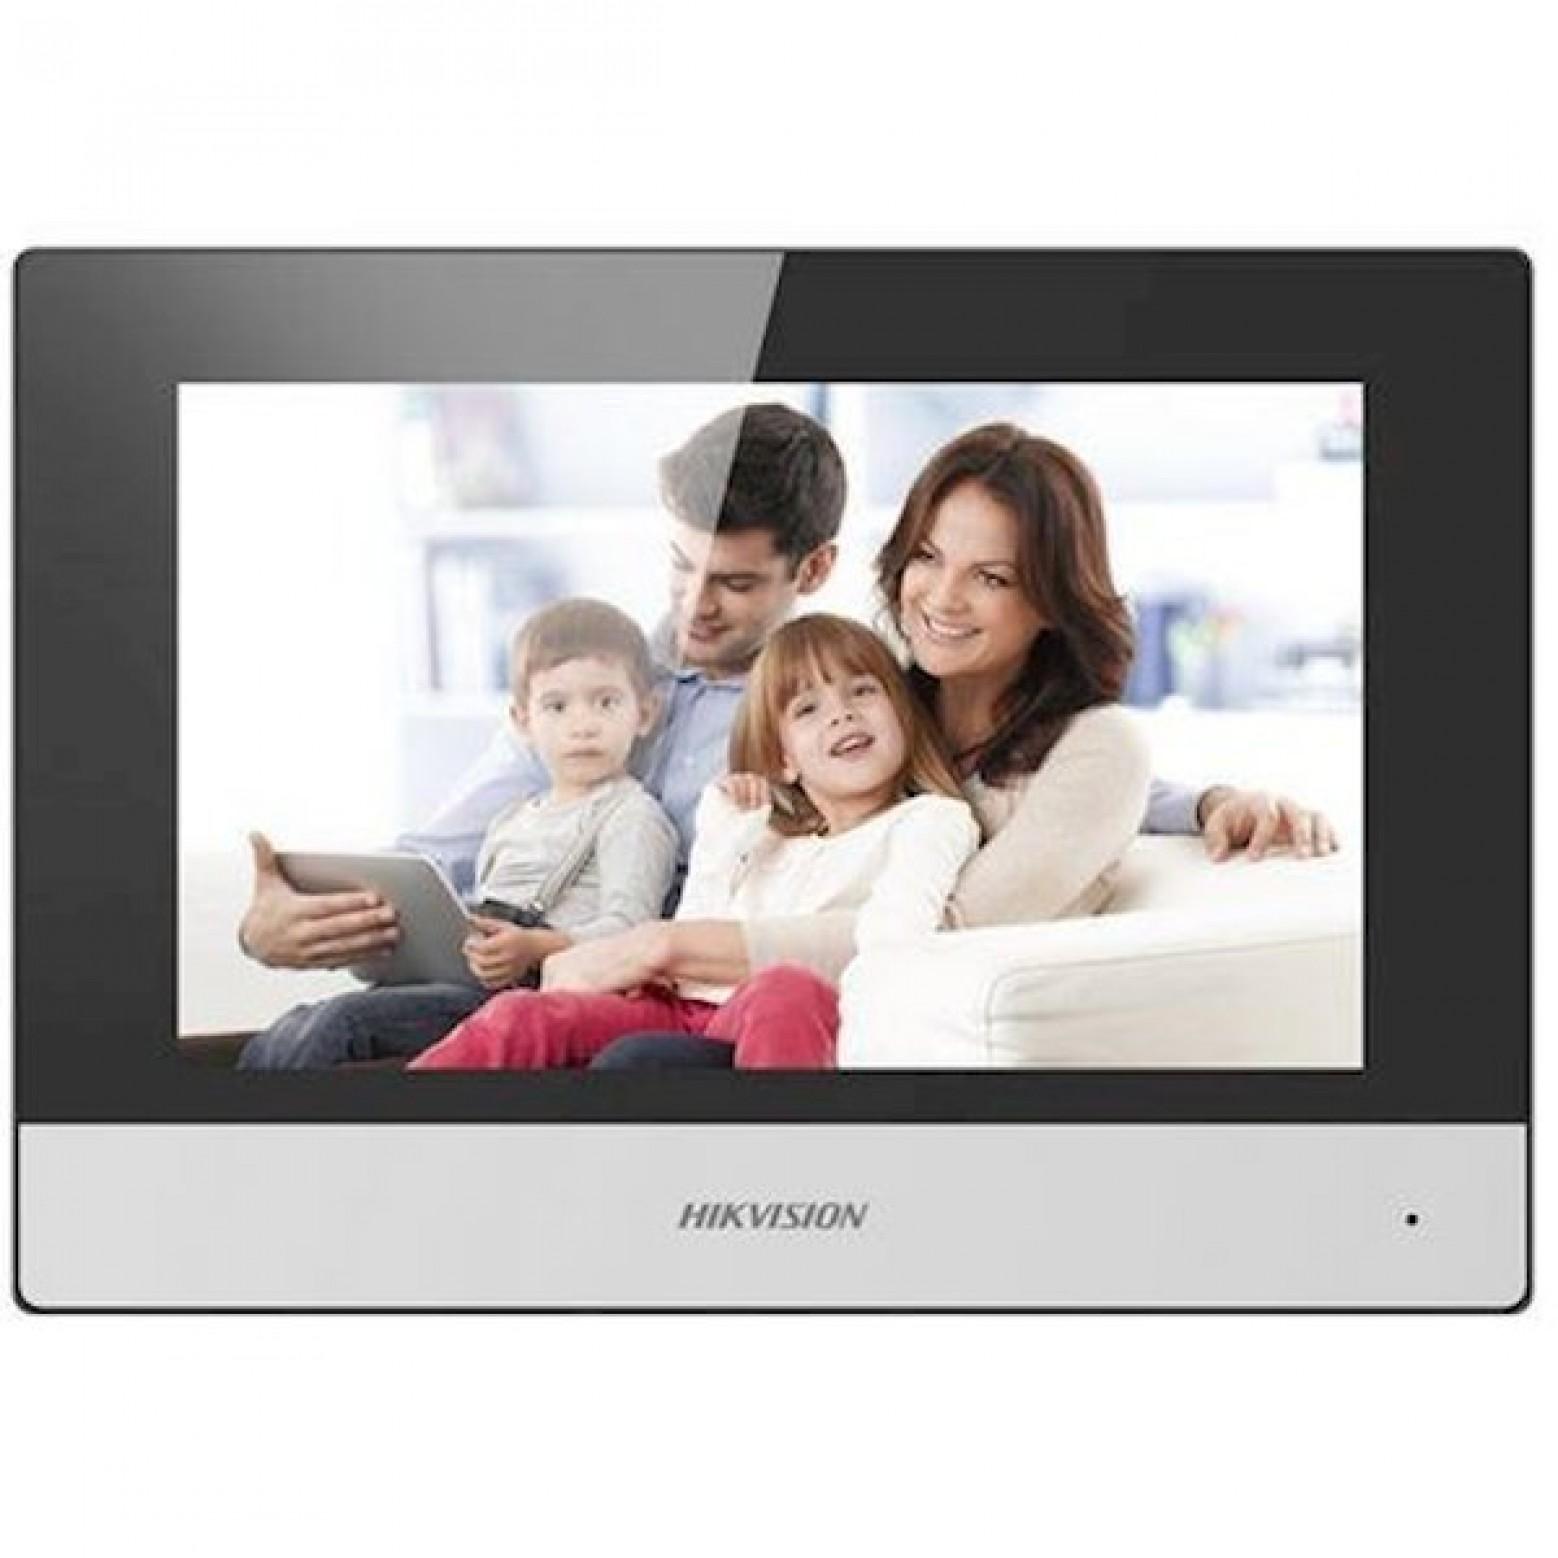 Hikvision DS-KH6320-WTE 7 inch binnenpost WiFi